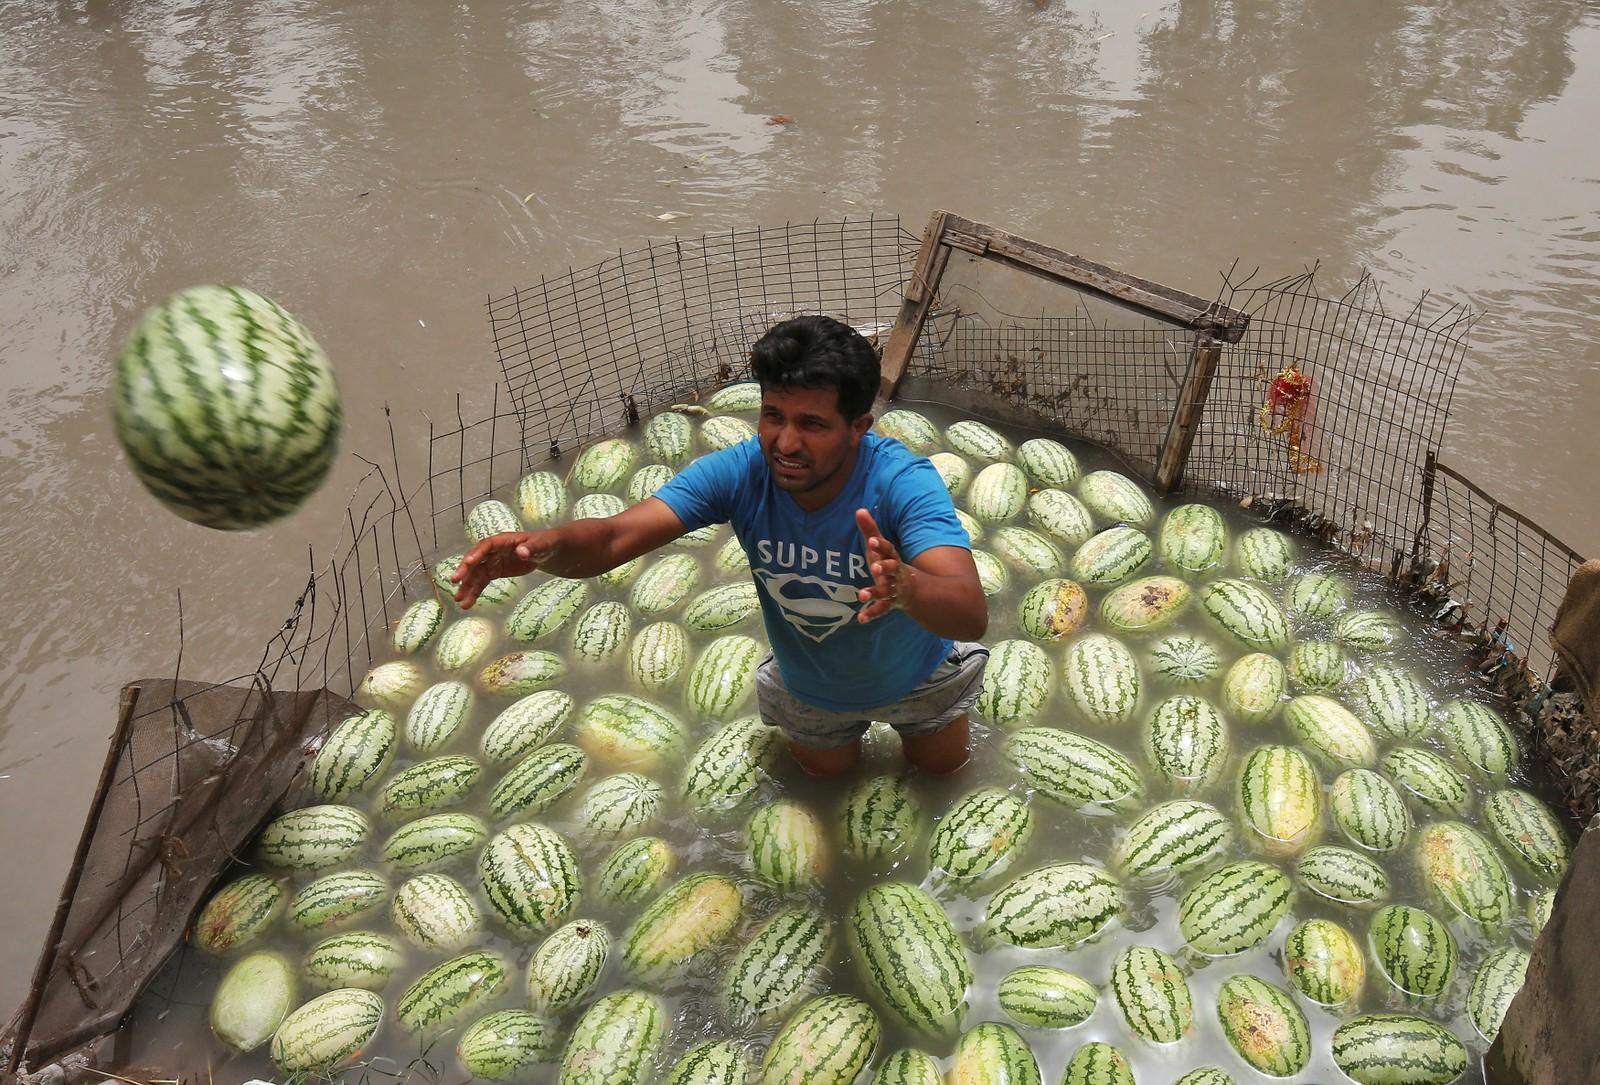 Vannmelon i vann en het sommerdag i Jammu, India.